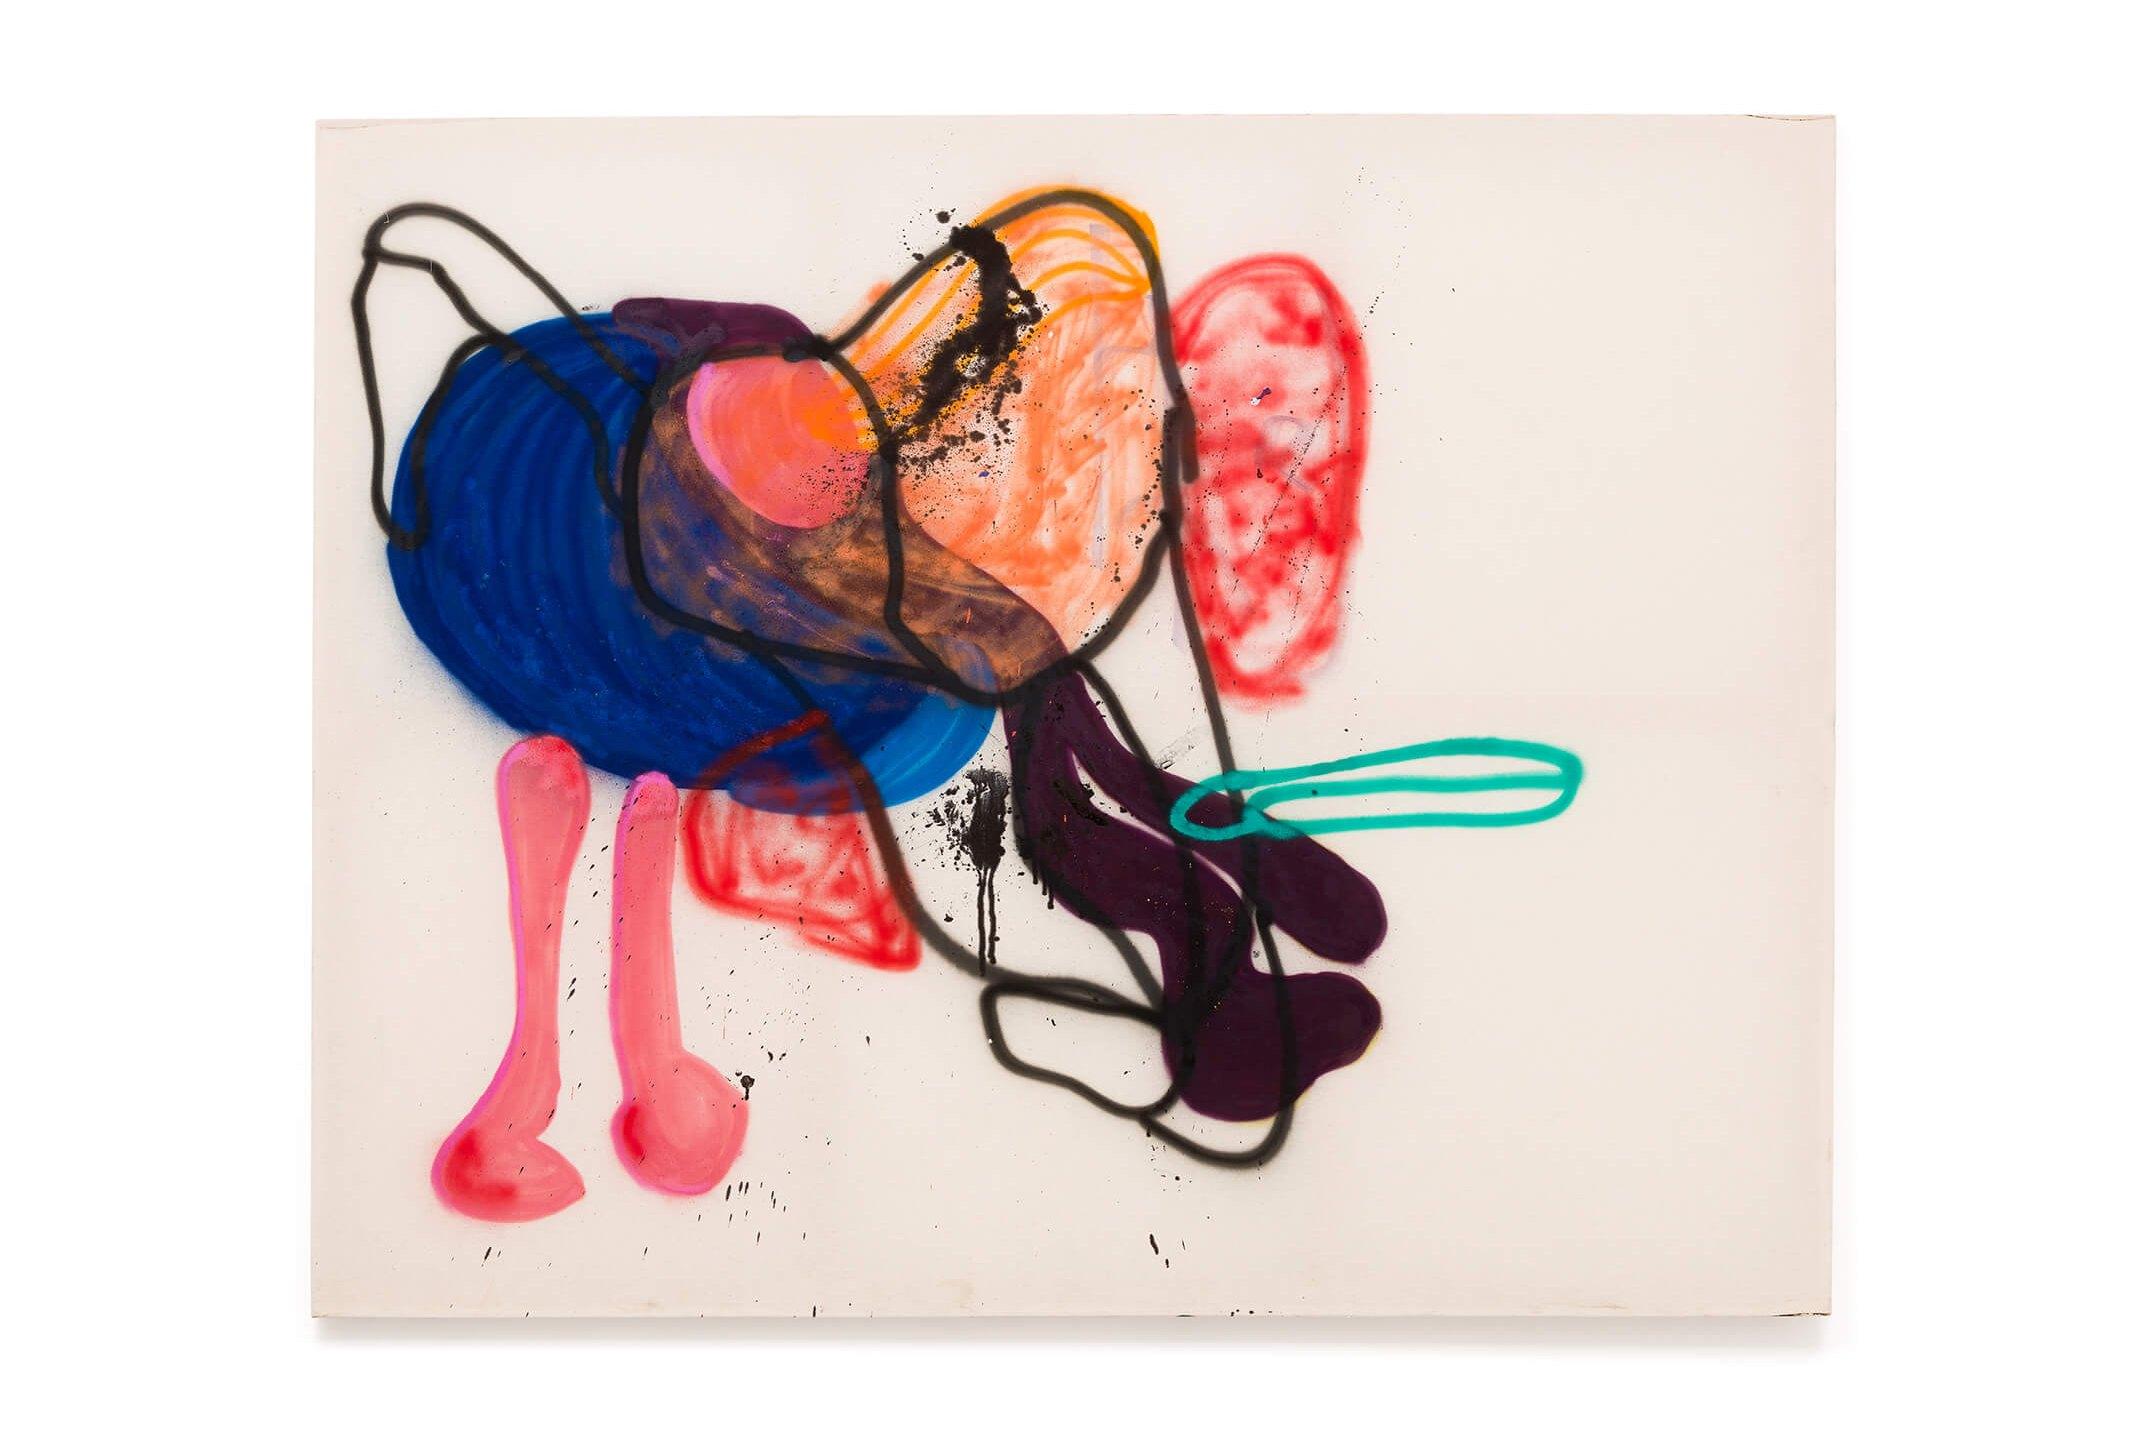 Cibelle Cavalli Bastos,<em>&nbsp;Retrato Subjetivo na Soltura</em>, 2016,&nbsp;spray and pen ink on cotton canvas,&nbsp;178 × 230 - Mendes Wood DM